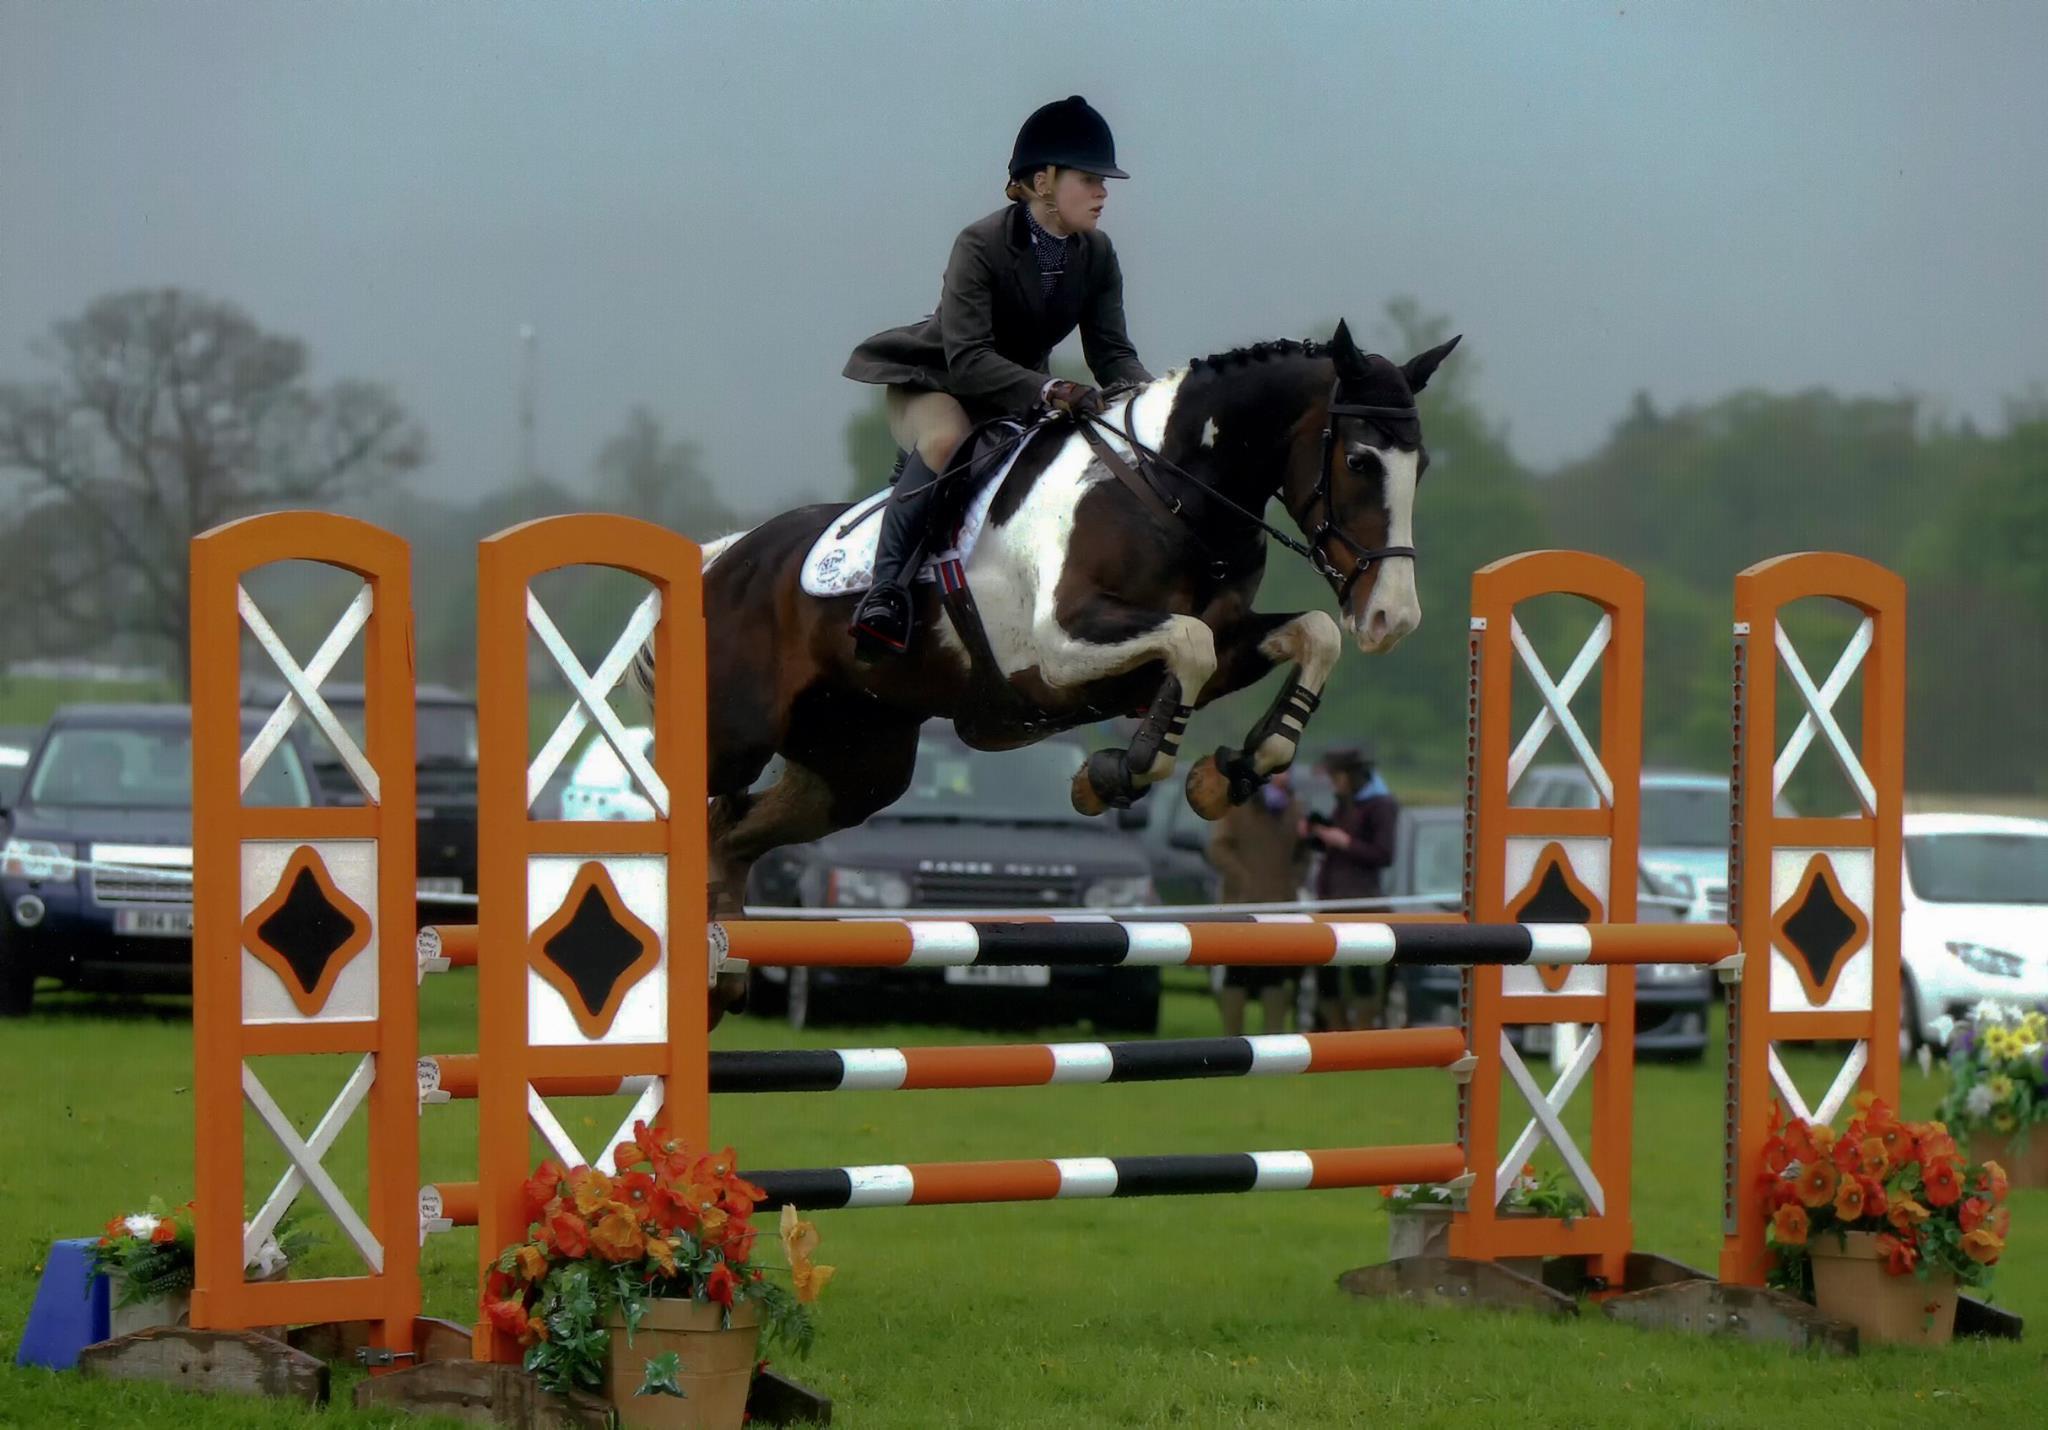 Equestrian Services